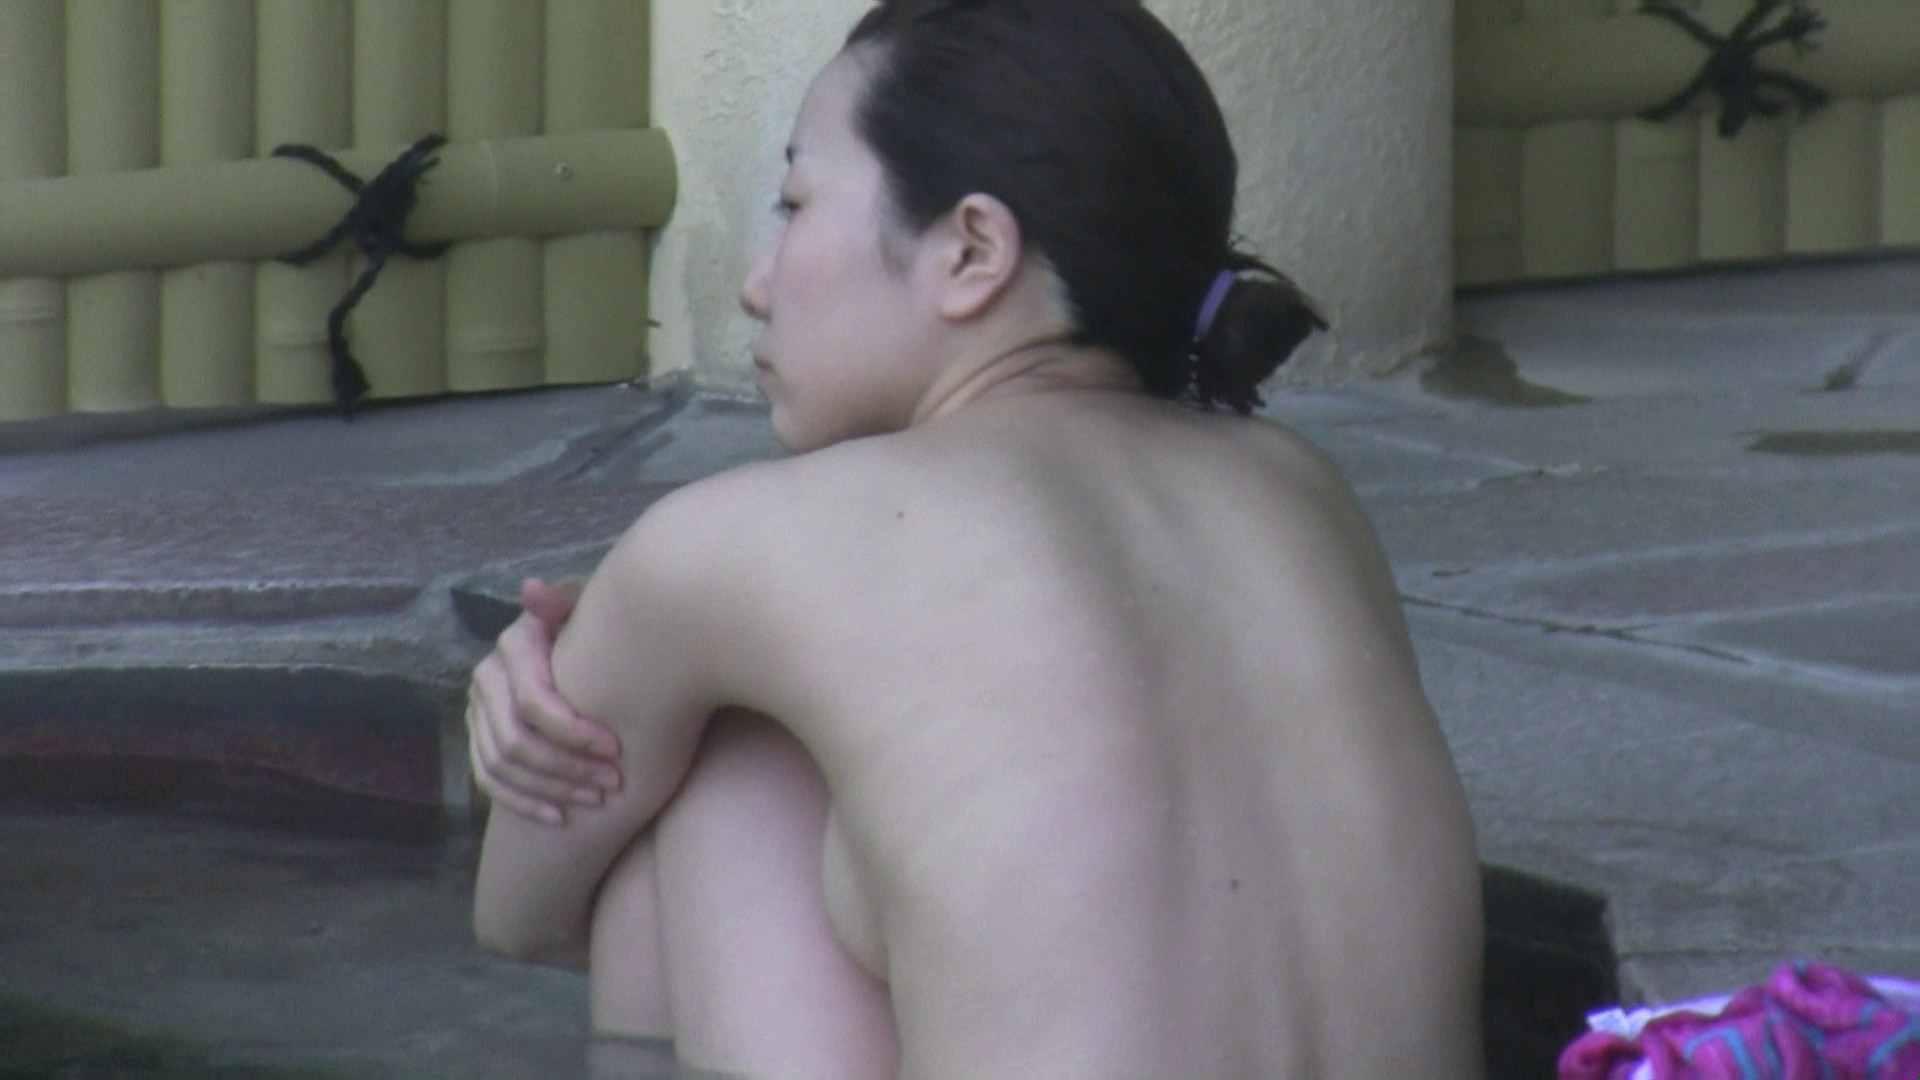 Aquaな露天風呂Vol.88【VIP限定】 綺麗なOLたち | 盗撮  57枚 28